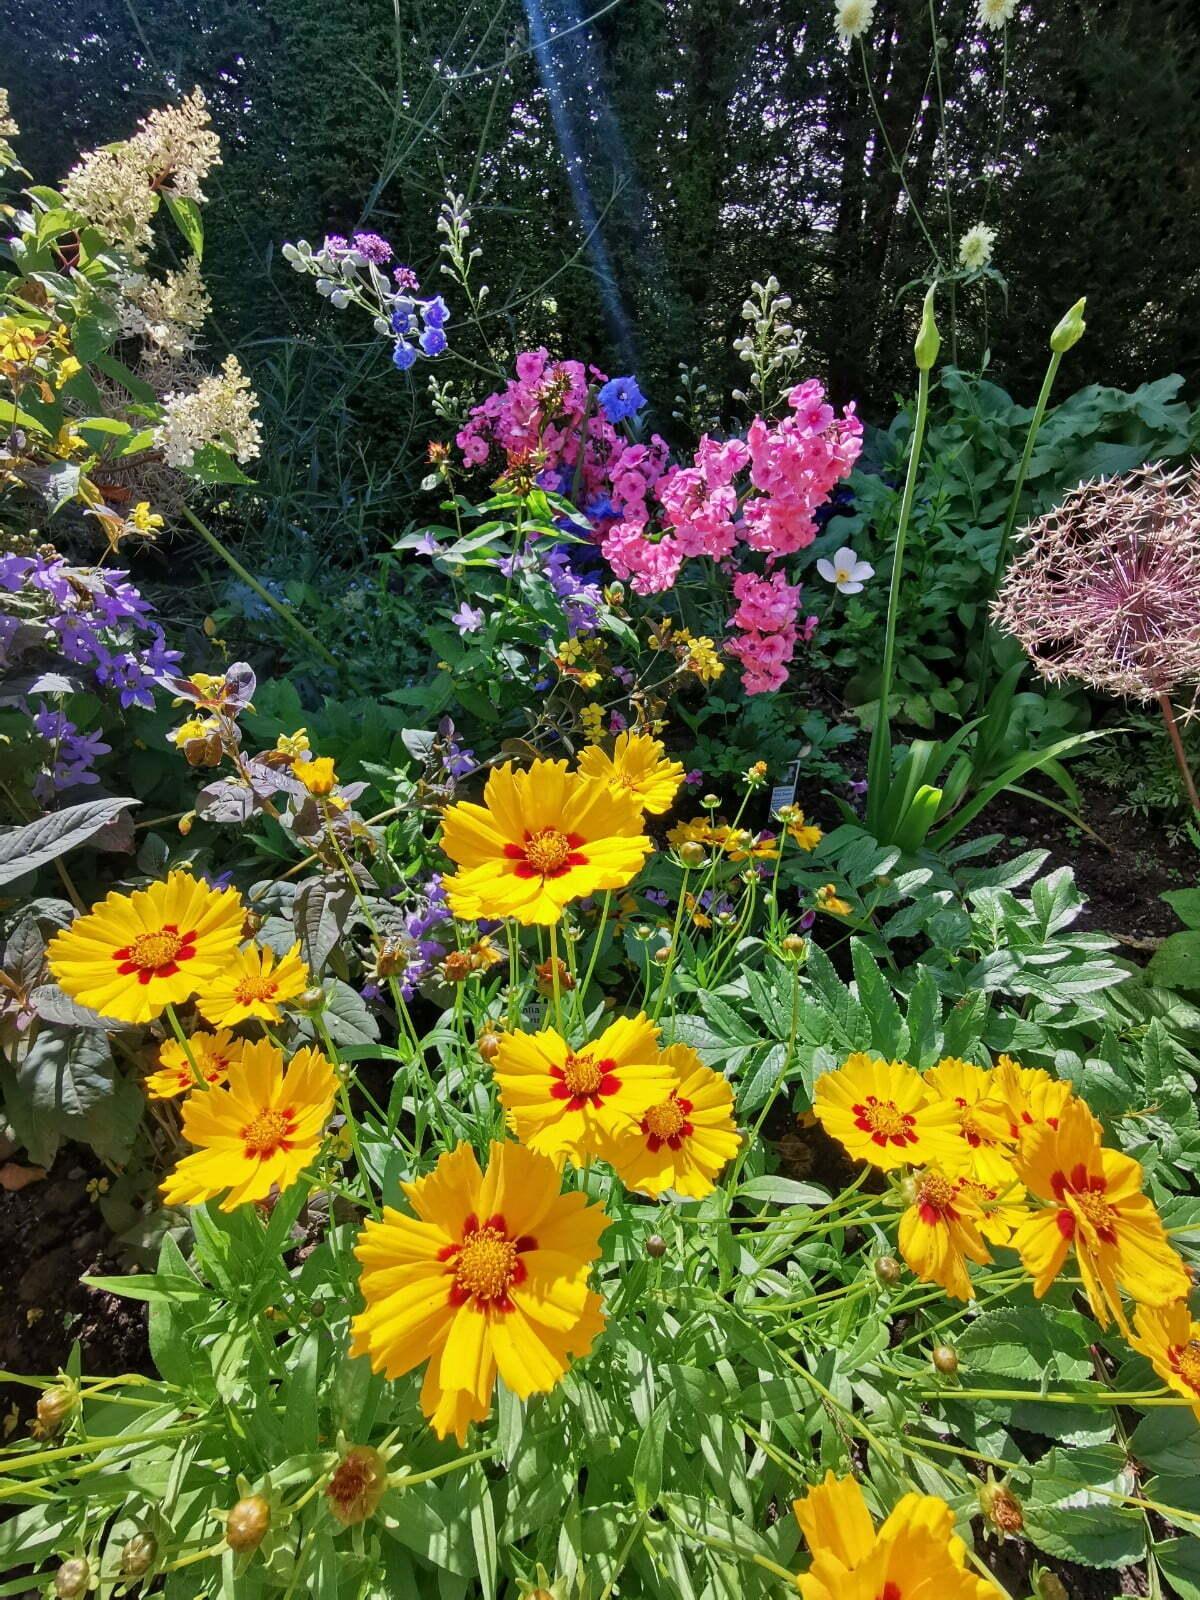 Bateman's Garden: A Kaleidoscope of Colours at Rudyard Kipling's National Trust Home 3